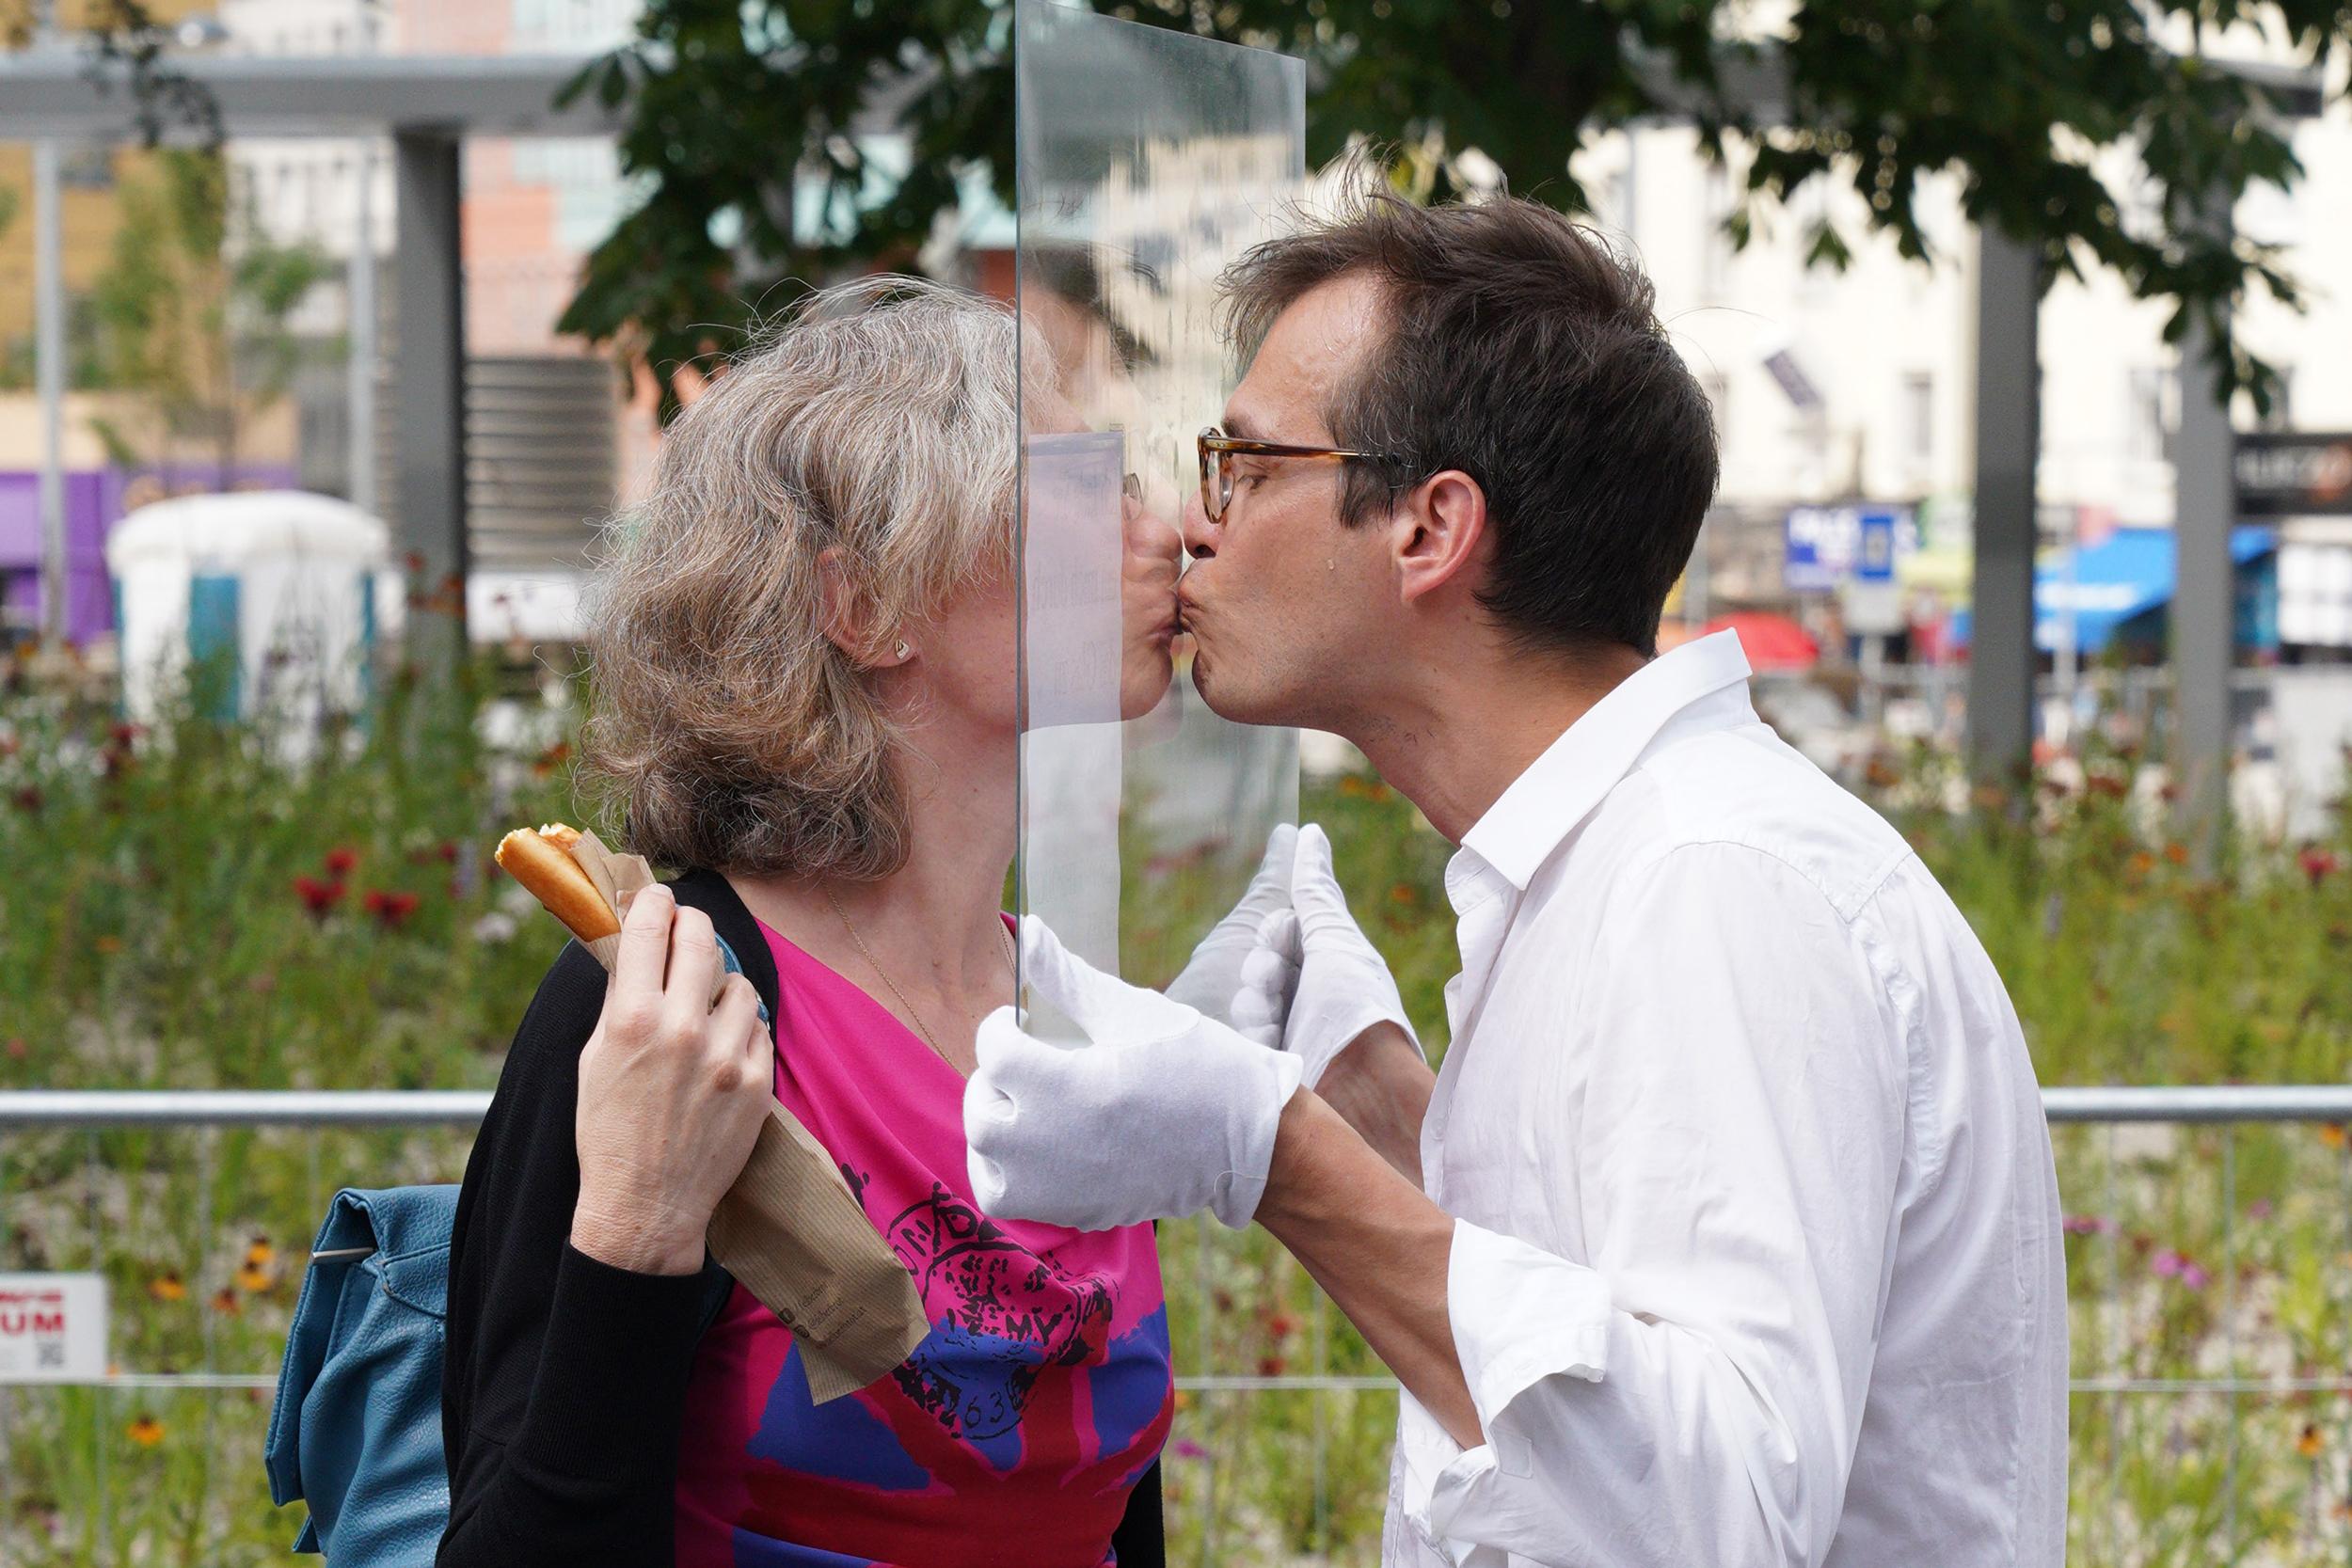 photo: KISS: Thomas Geiger, Festival of Minimal Actions: Jiří Kovanda, Kissing through glass, Foto: Kunsthalle Wien, 2020